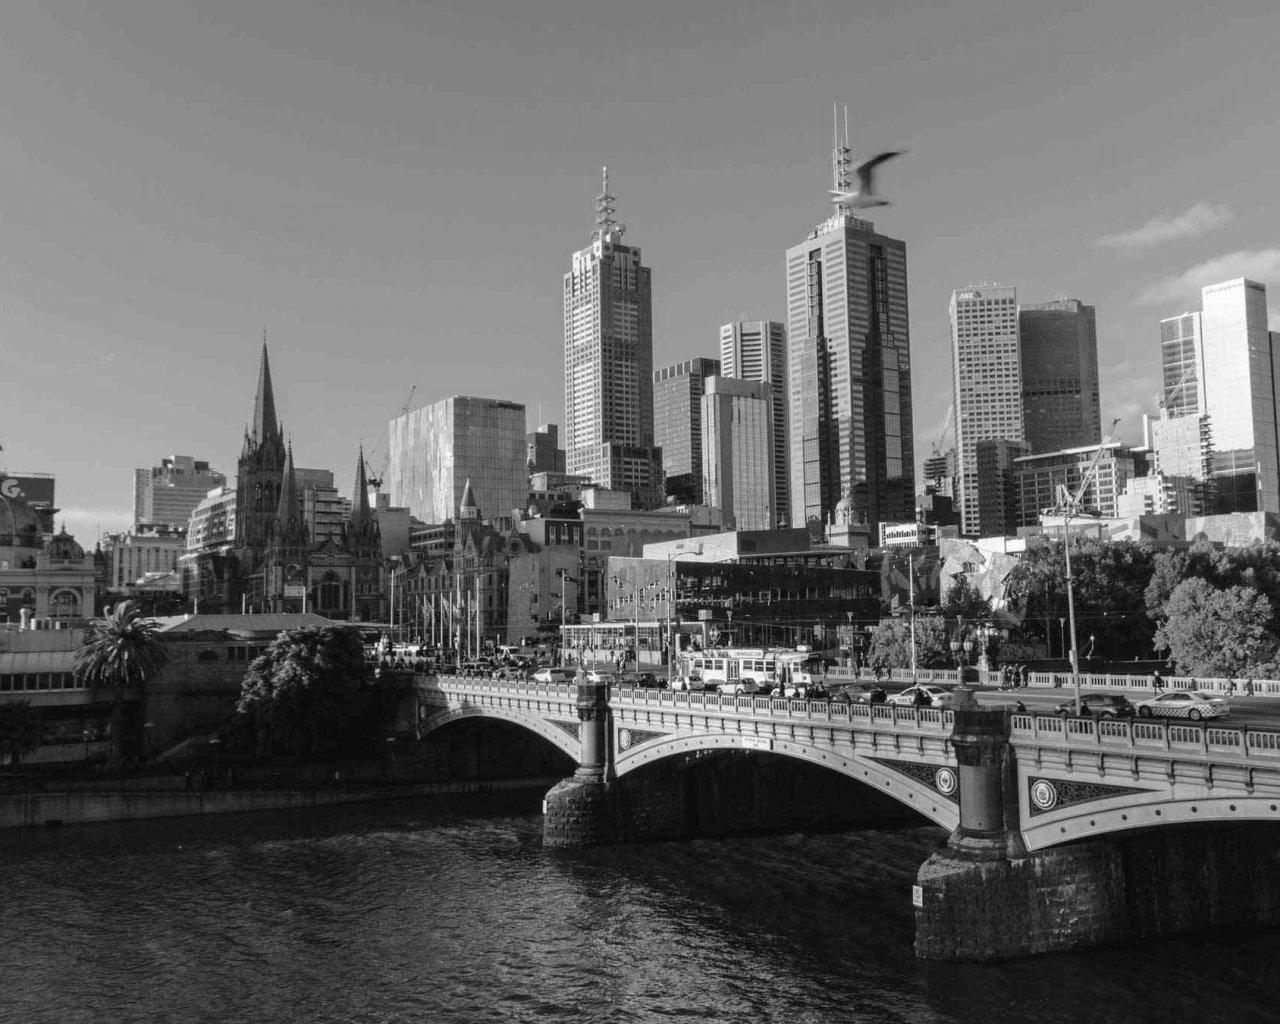 Melbourne TBC tickets